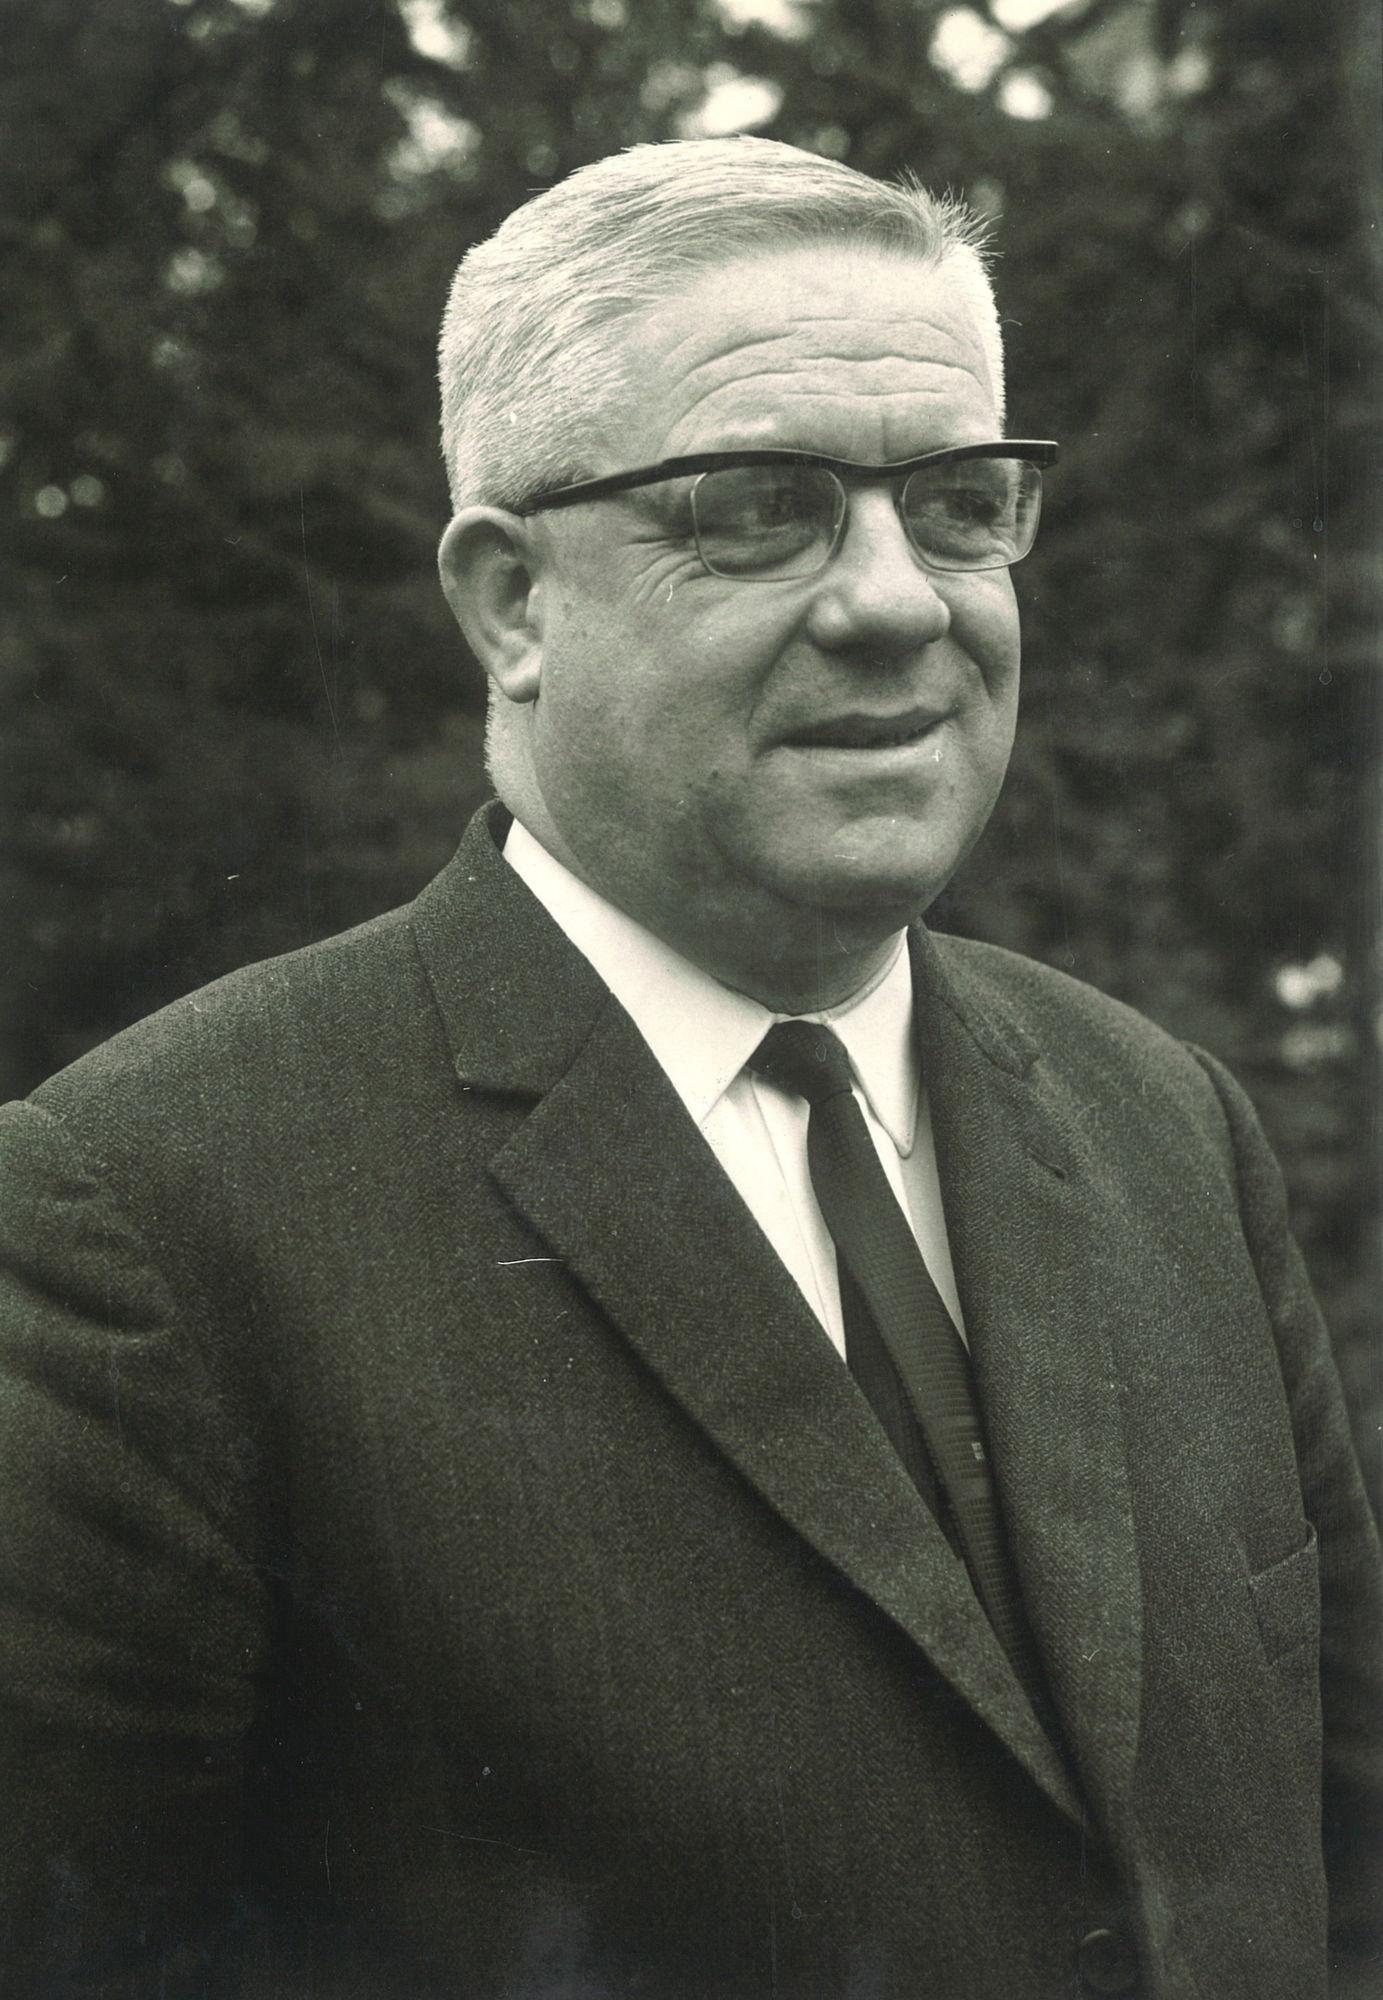 Pol Verhenne